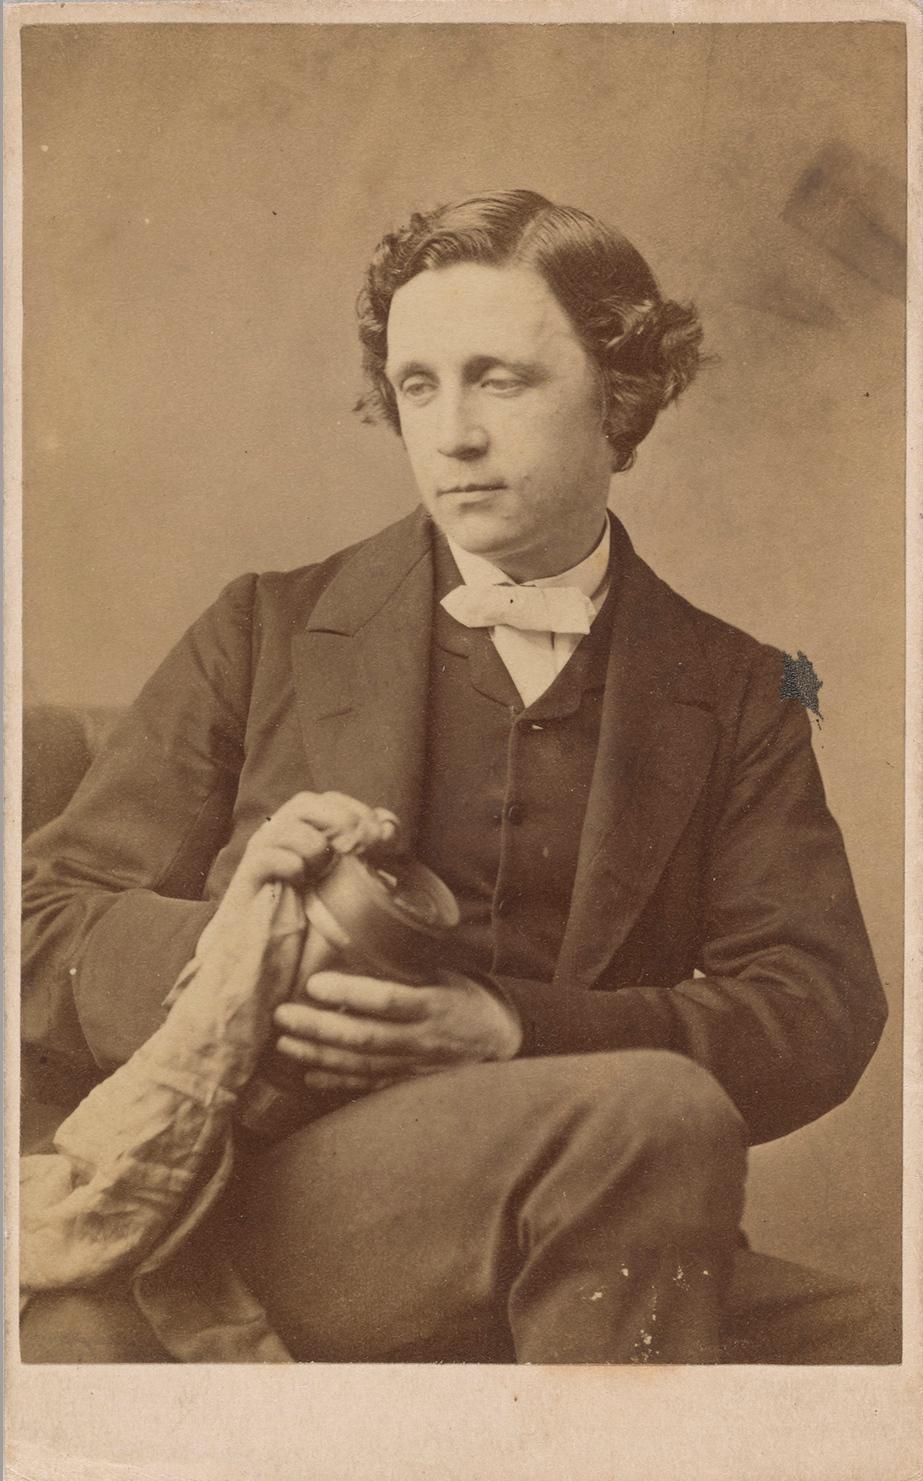 Rejlander, O. G. (Oscar Gustav), 1813-1875   Carte de visite photograph of Lewis Carroll with lens  [1863] AAH 220